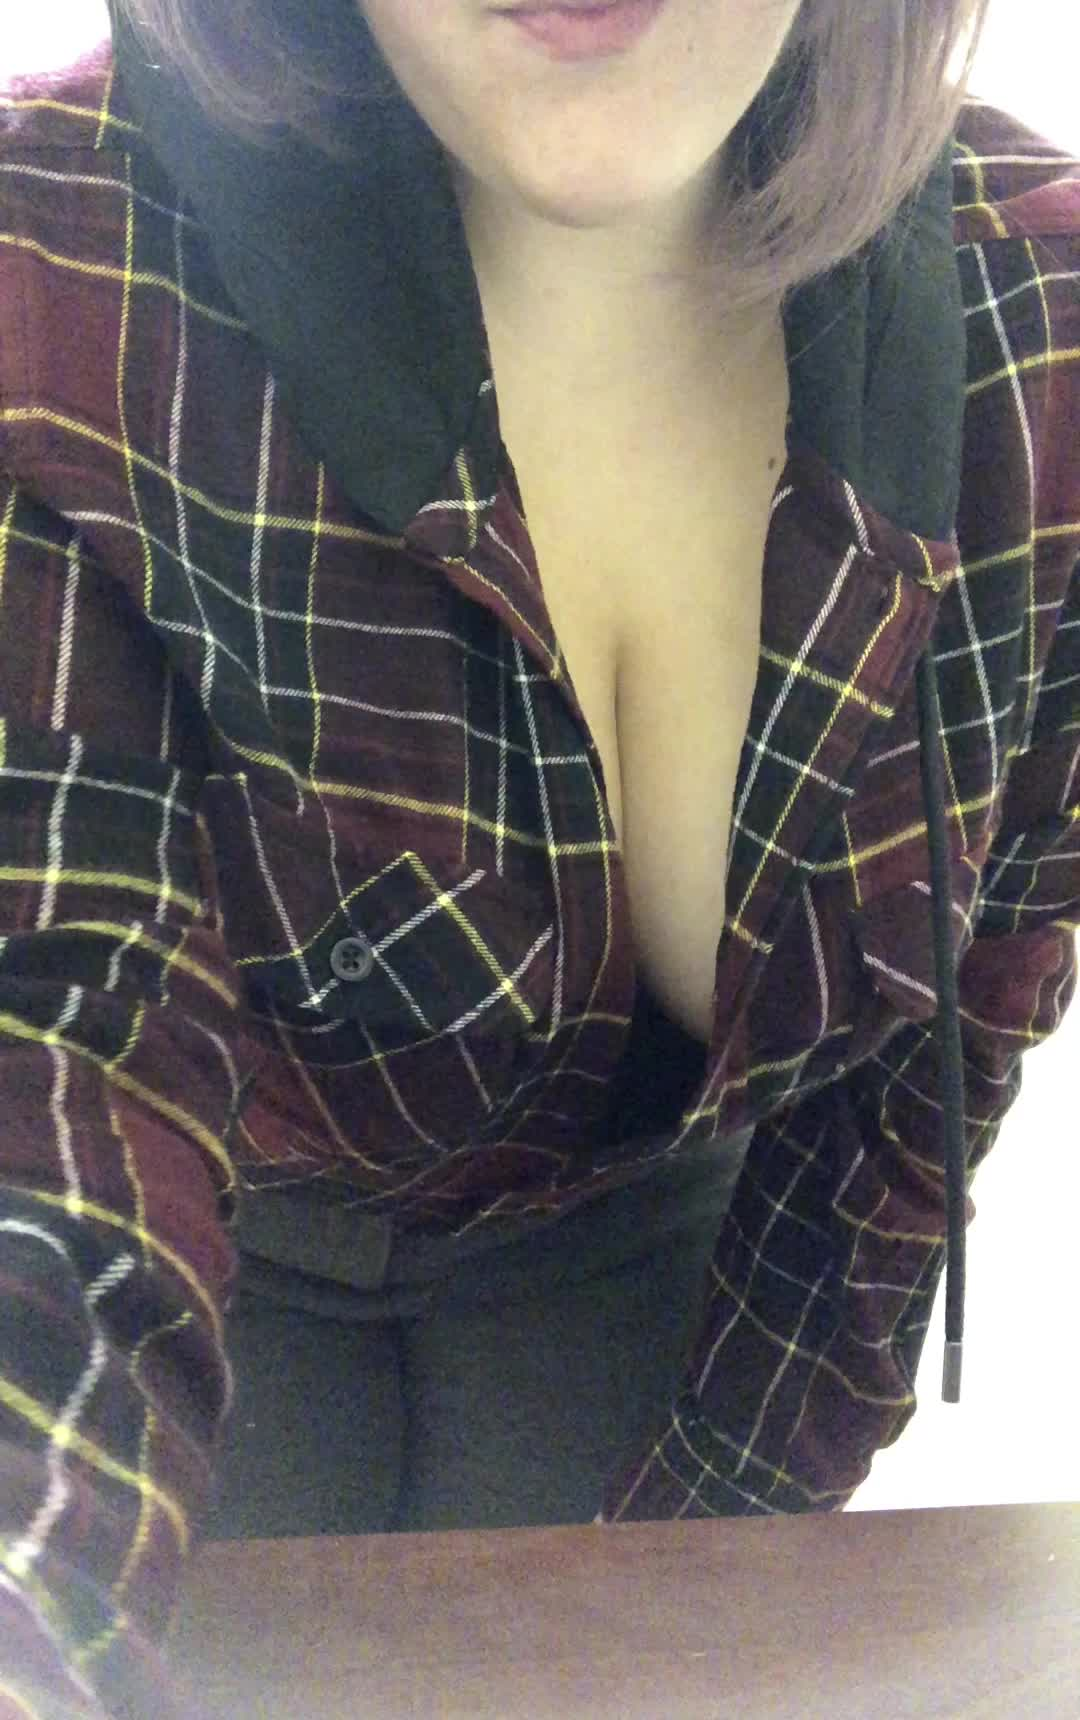 eelin myself - Went no bra and no panties today :)